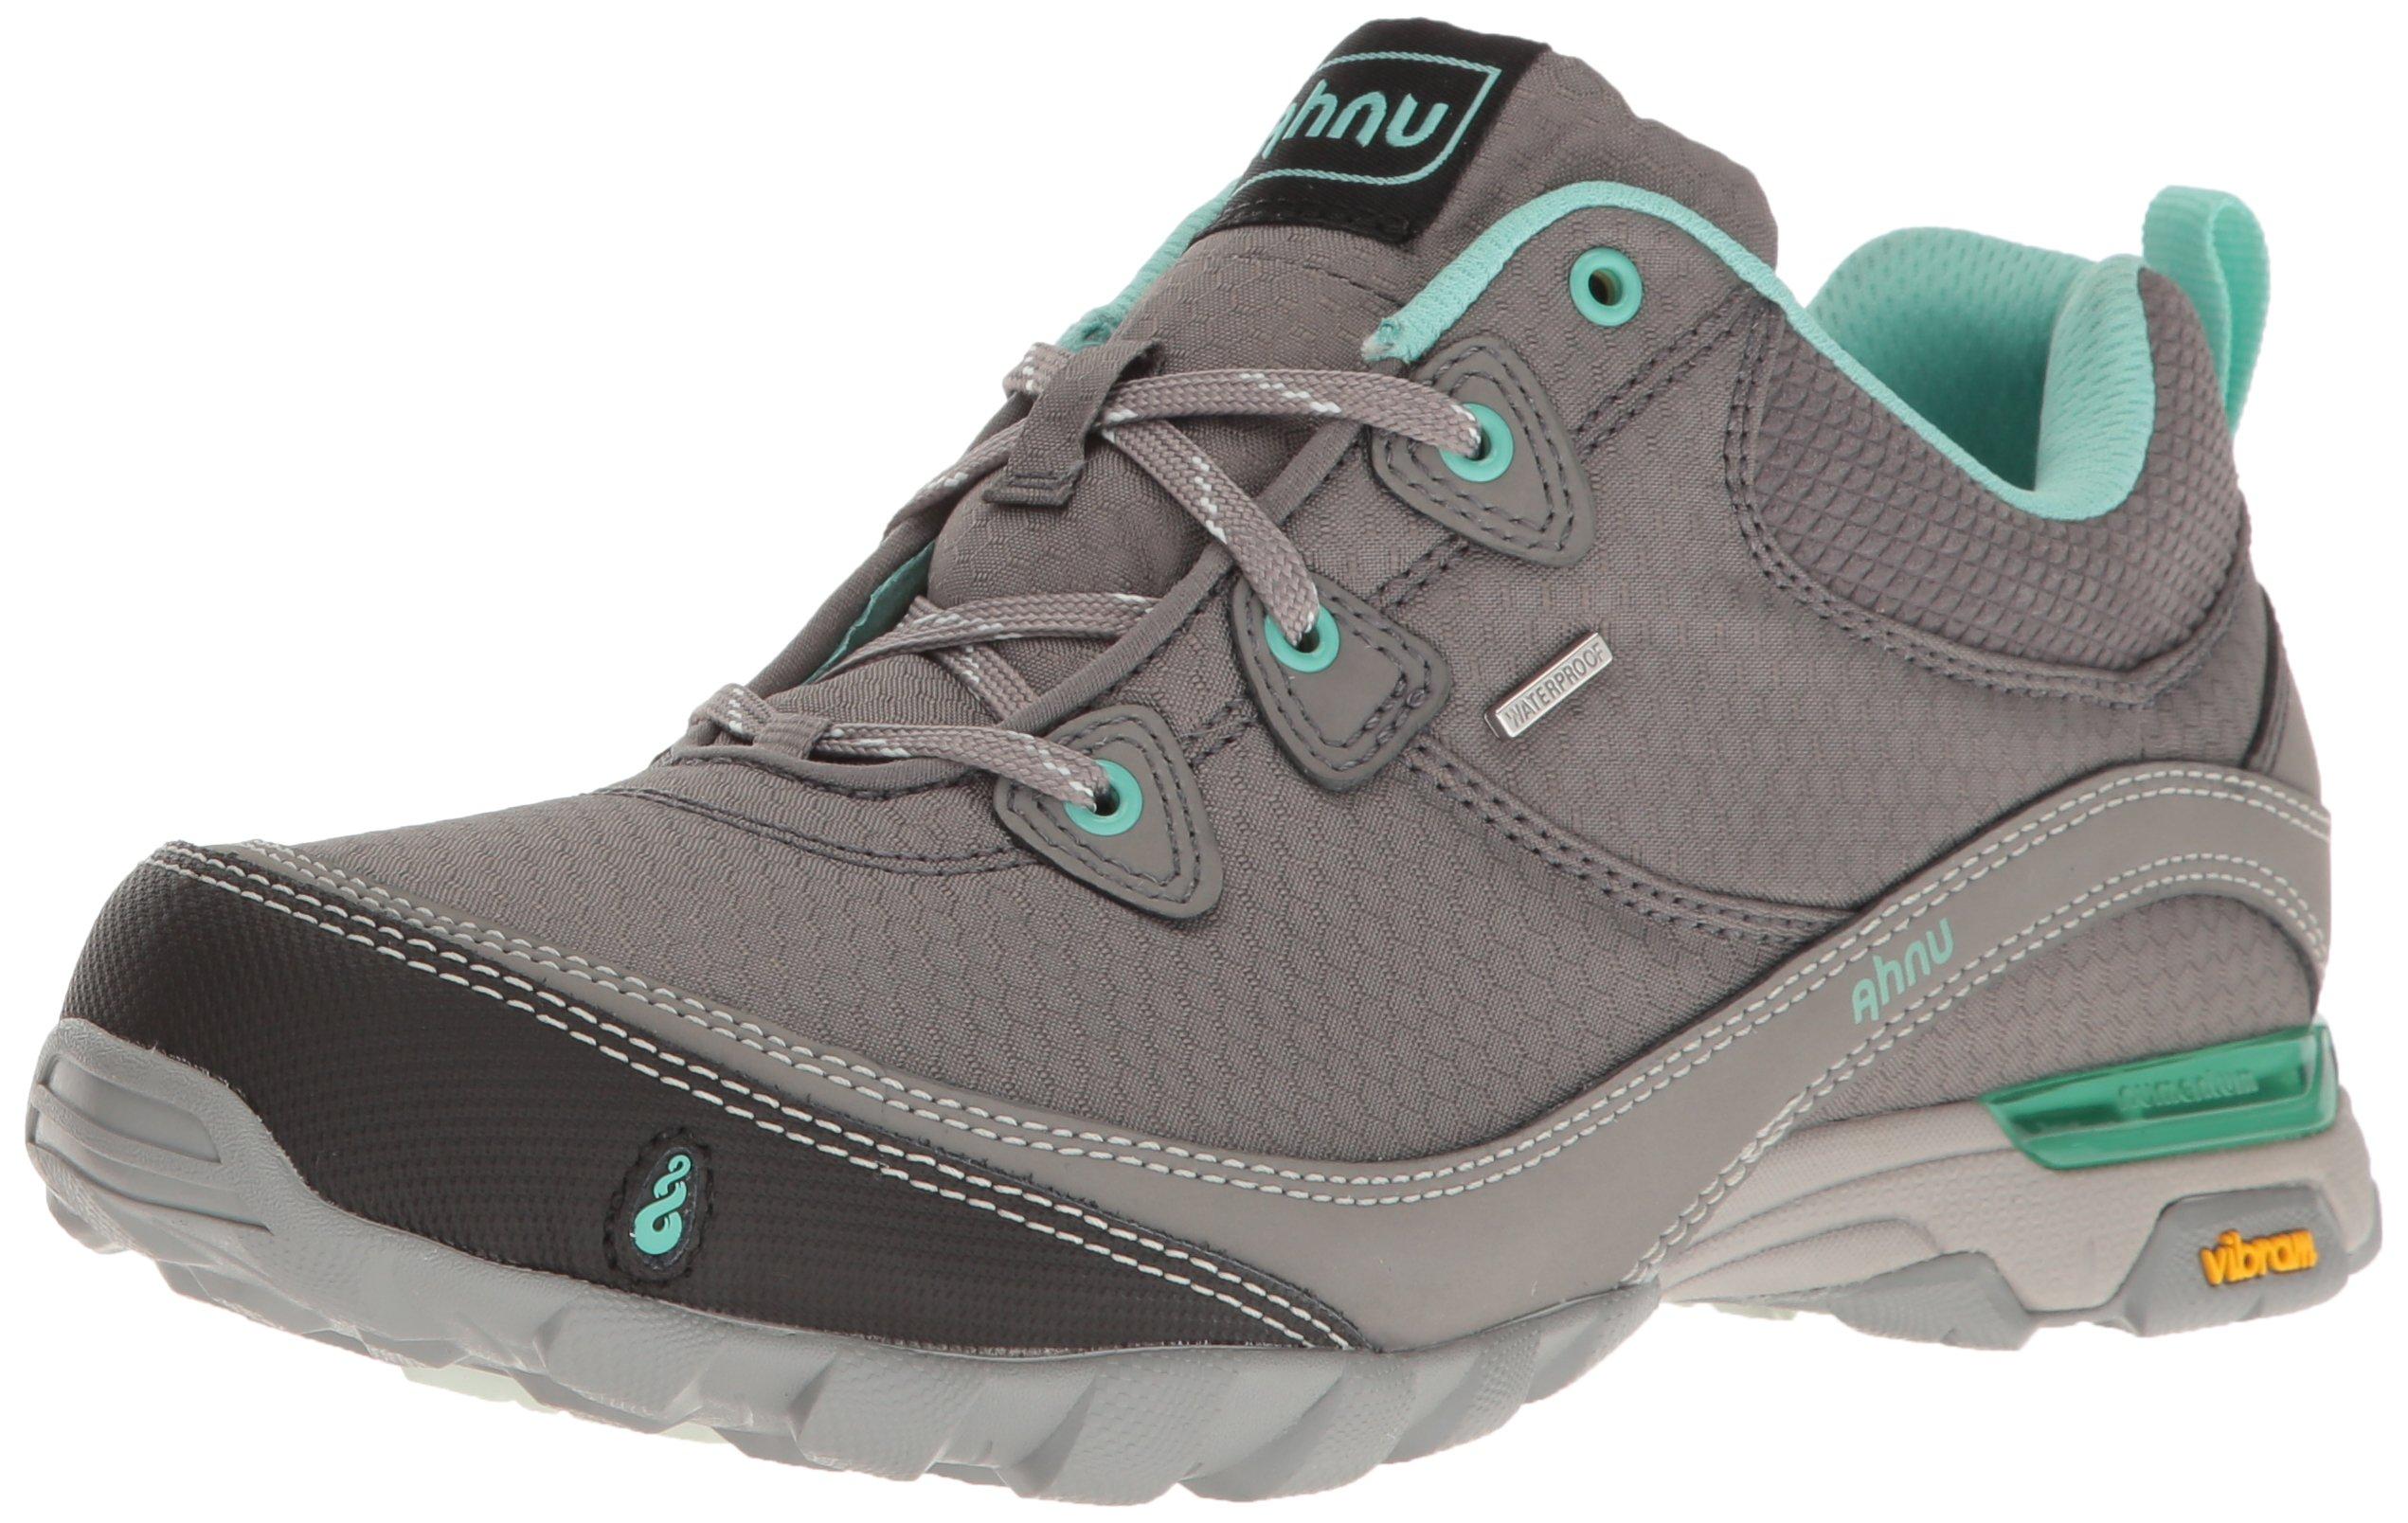 Ahnu Women's W Sugarpine Waterproof Hiking Shoe, New Dark Grey, 10 M US